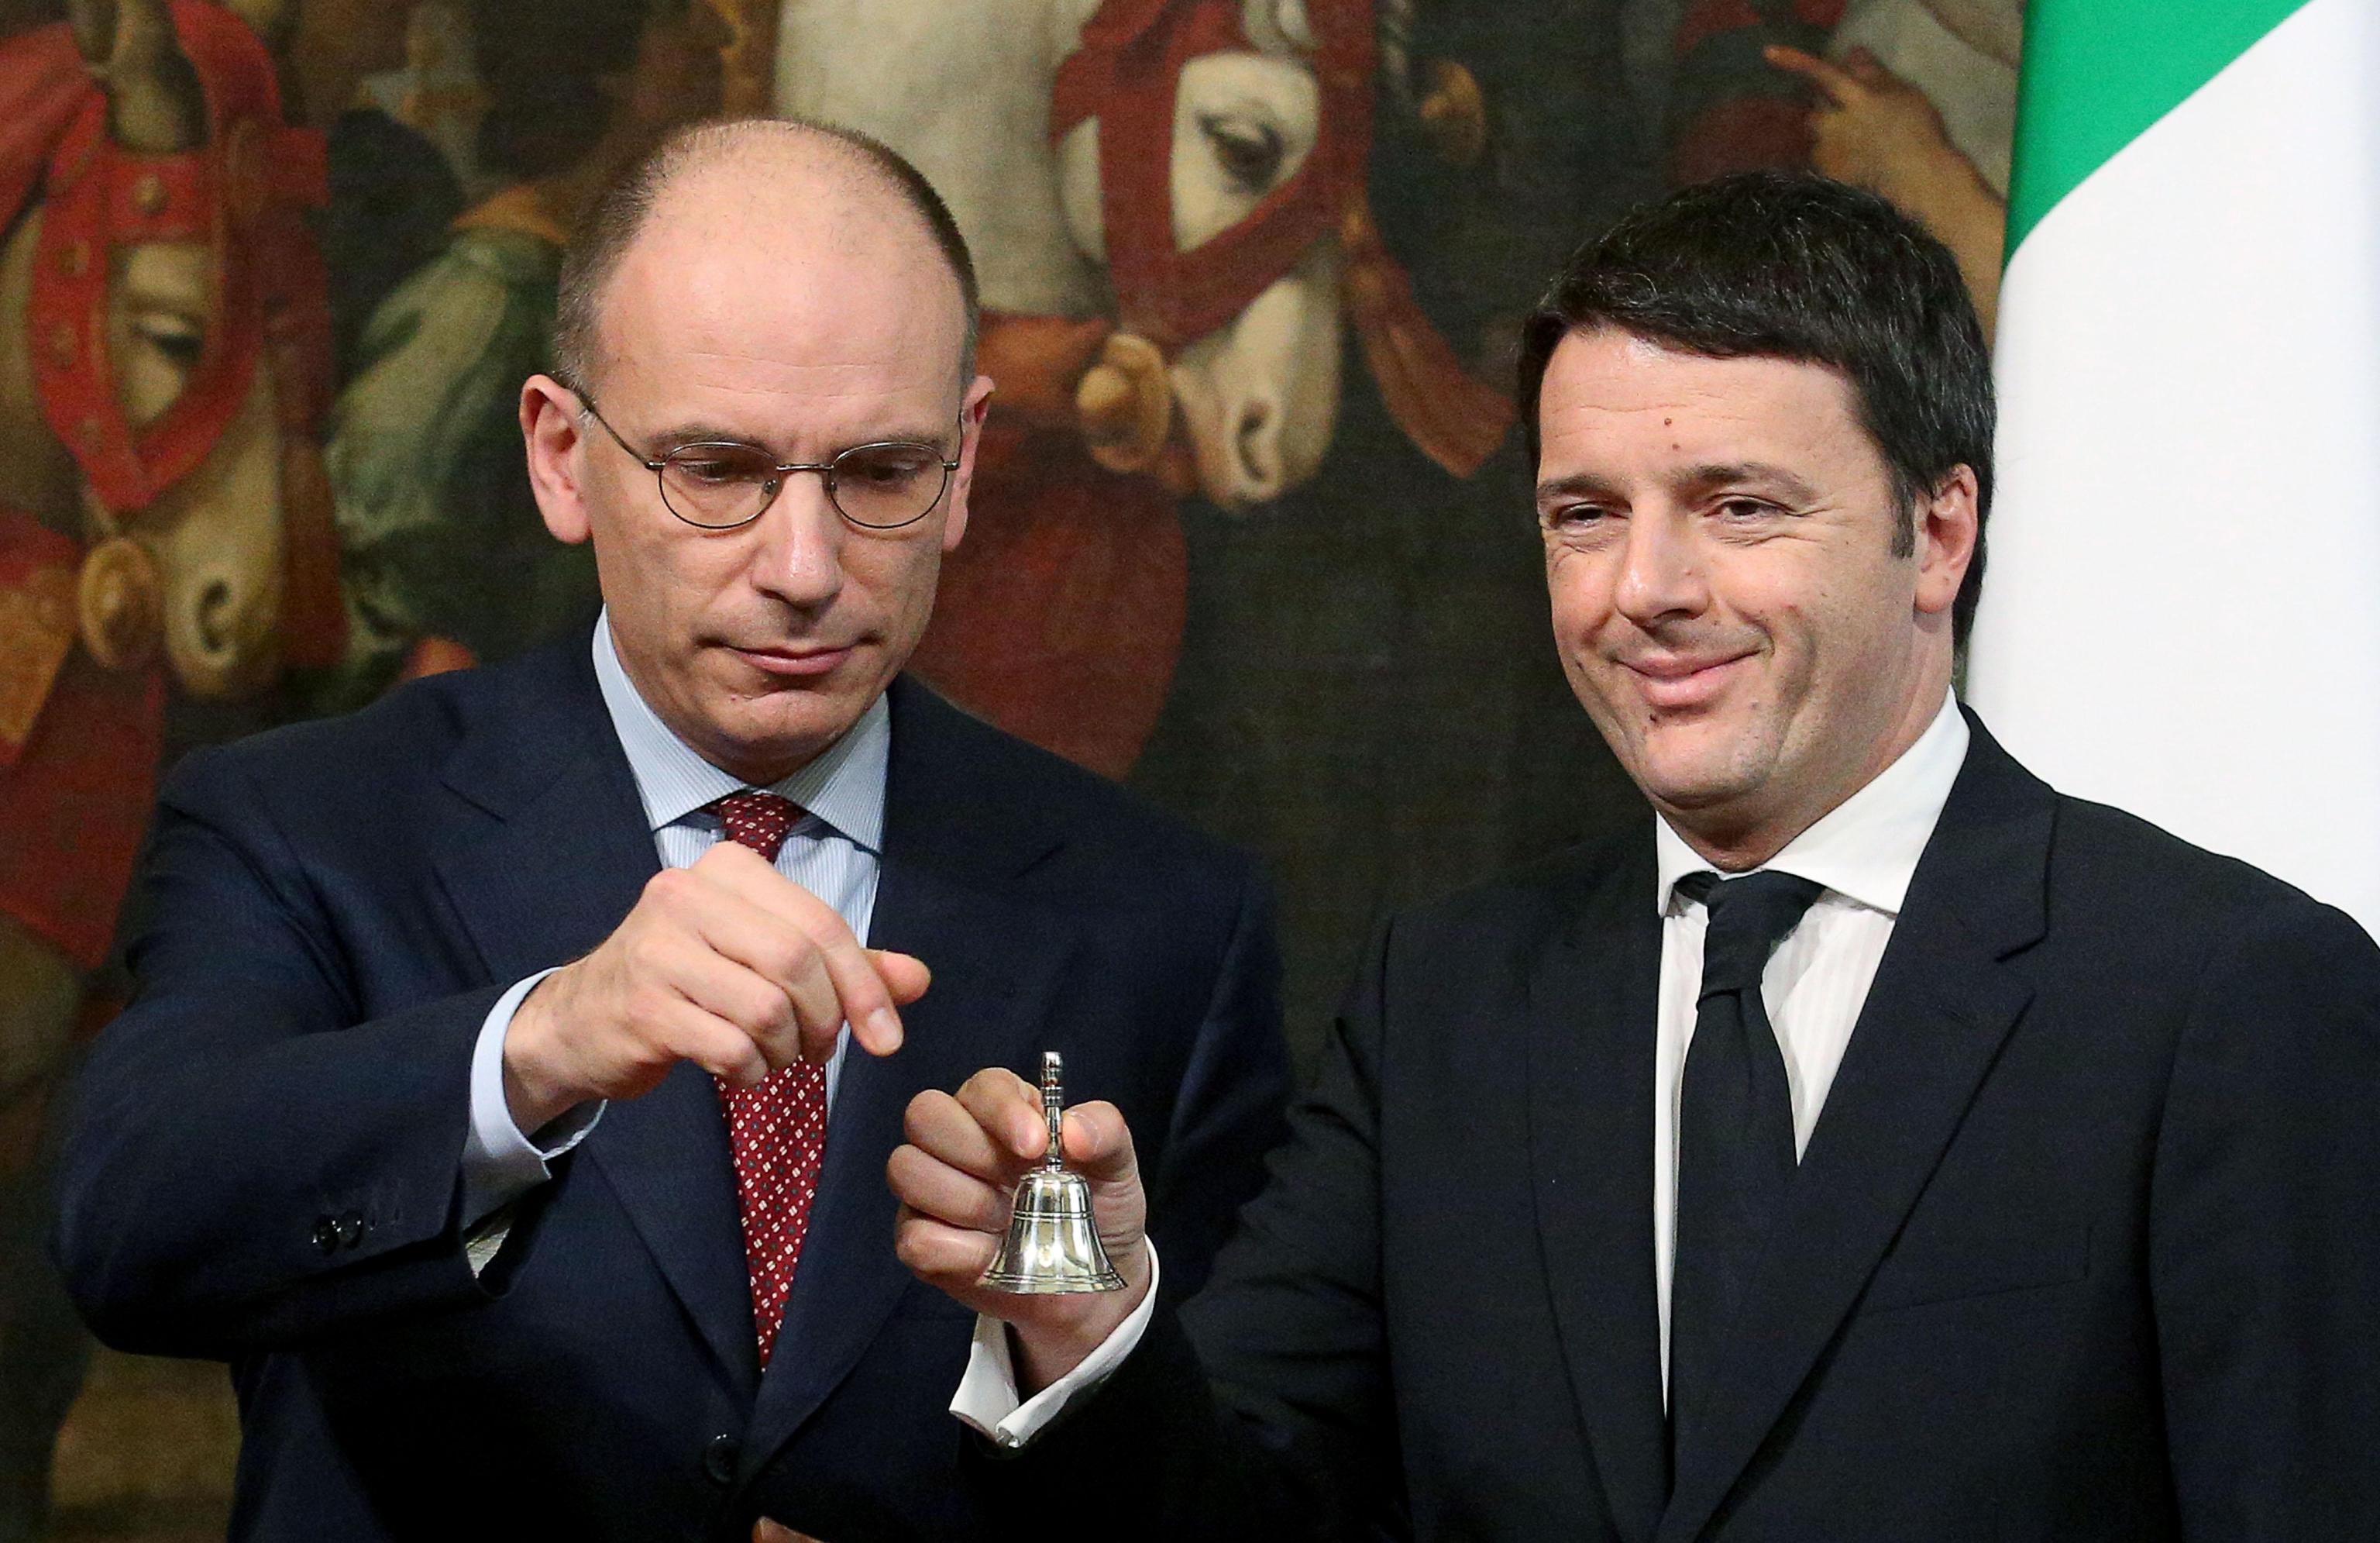 Renzi sworn in